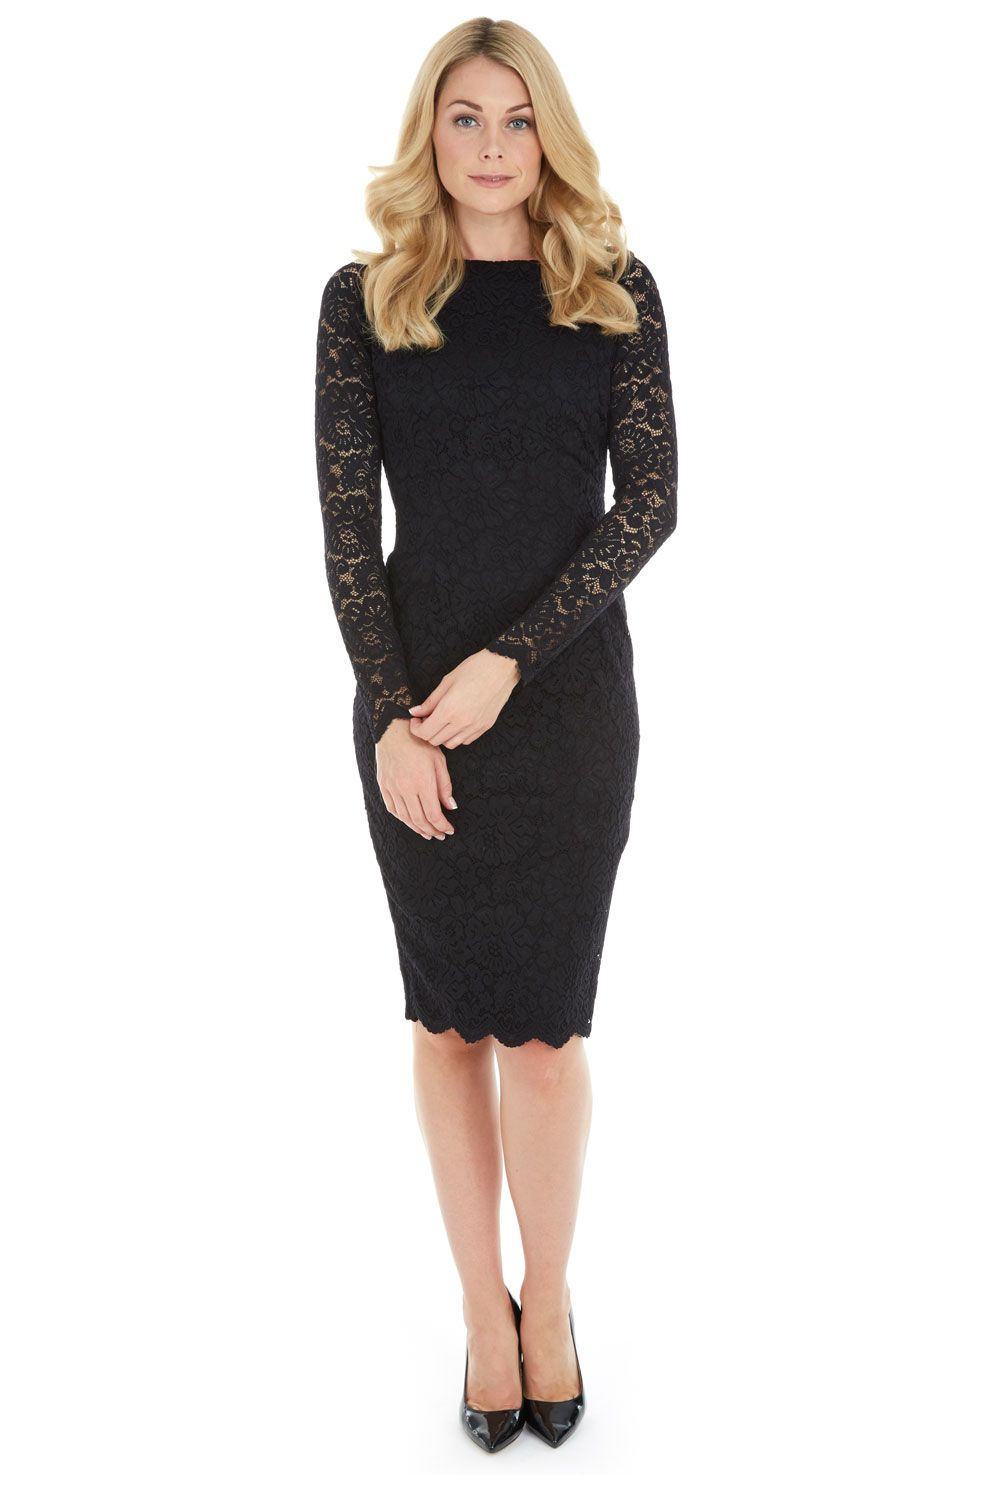 Blake Black Luxury Lace Pencil Dress - view 1 | pin-up | Pinterest ...